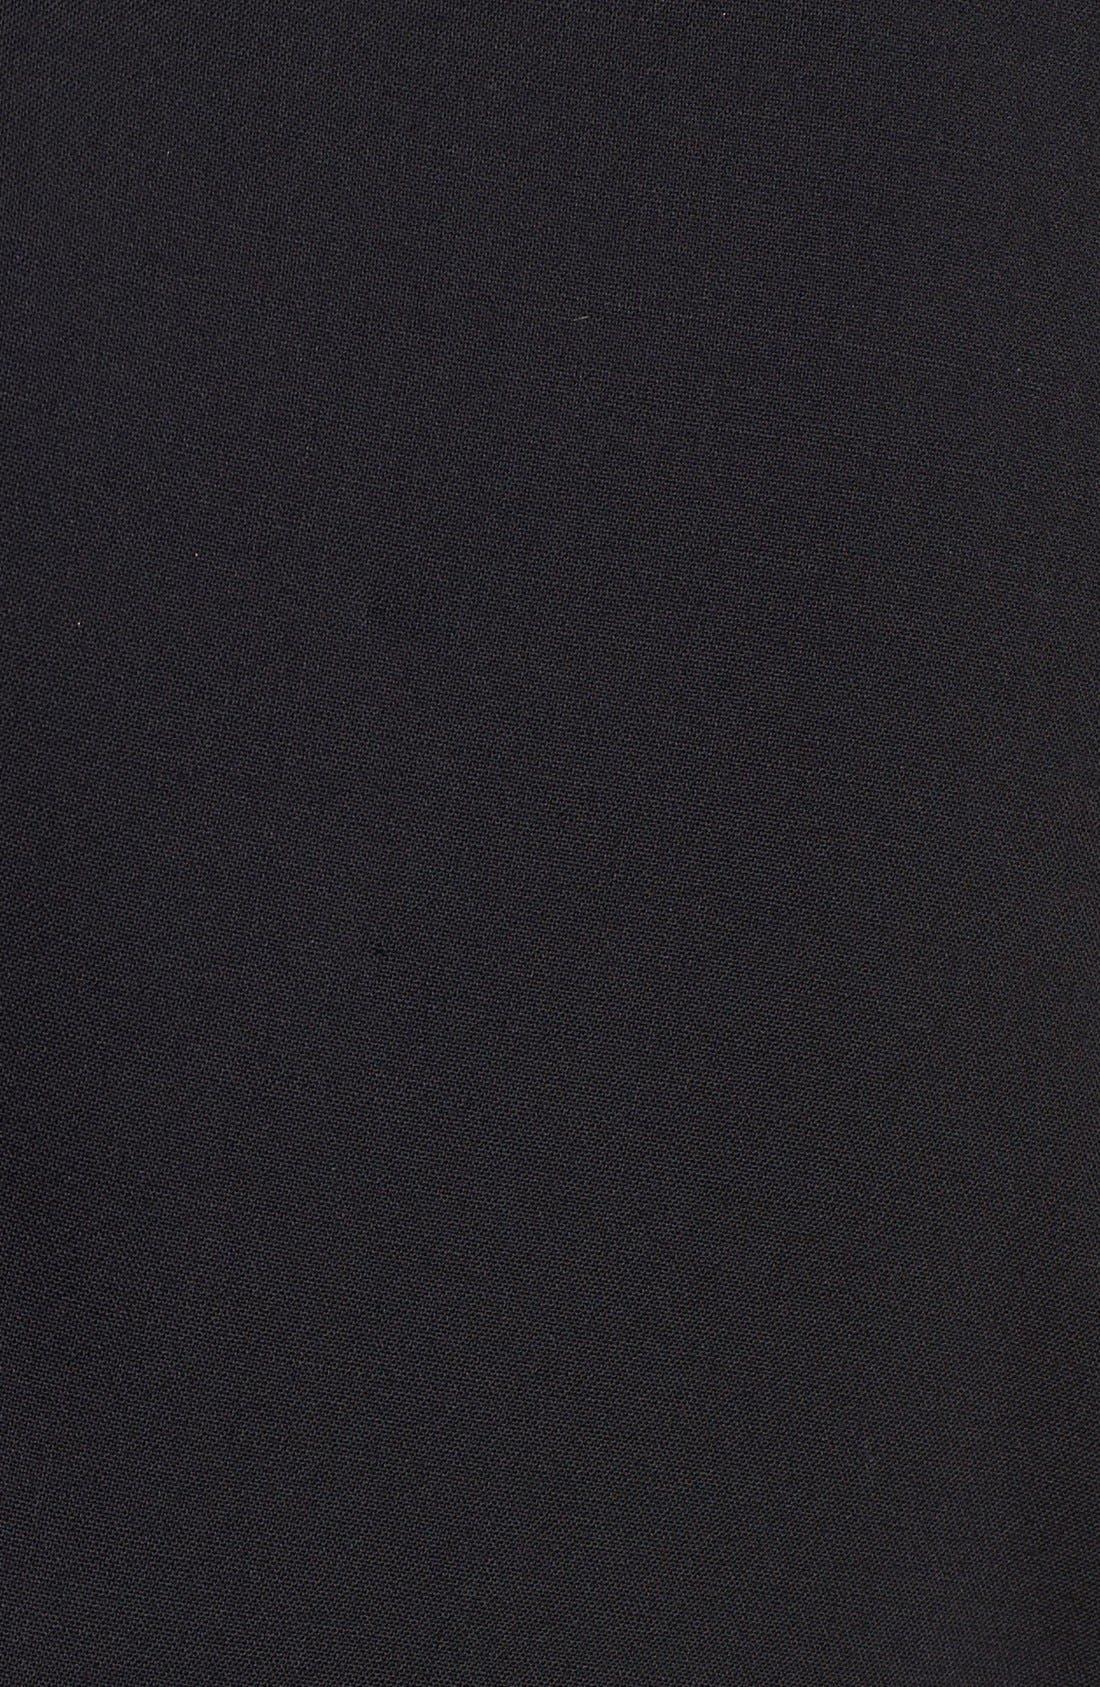 Alternate Image 3  - BOSS HUGO BOSS Sleeveless Sheath Dress